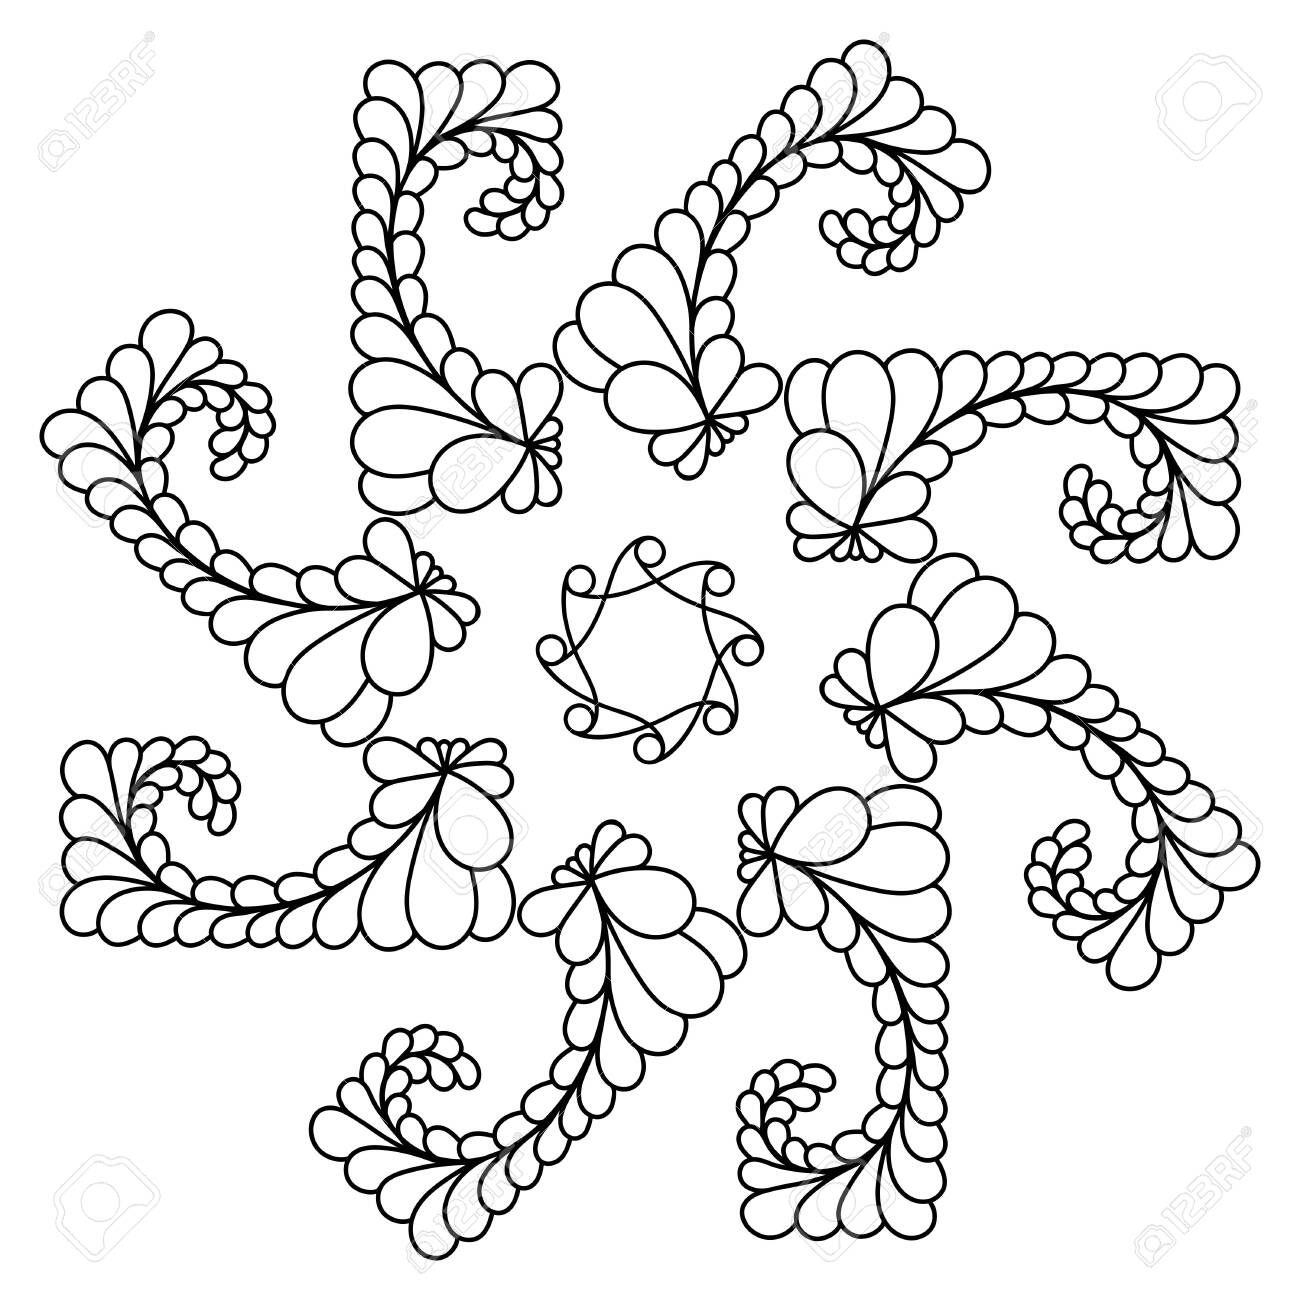 - A Simple Botanical Print Of A Mandala. Easy Coloring Illustration